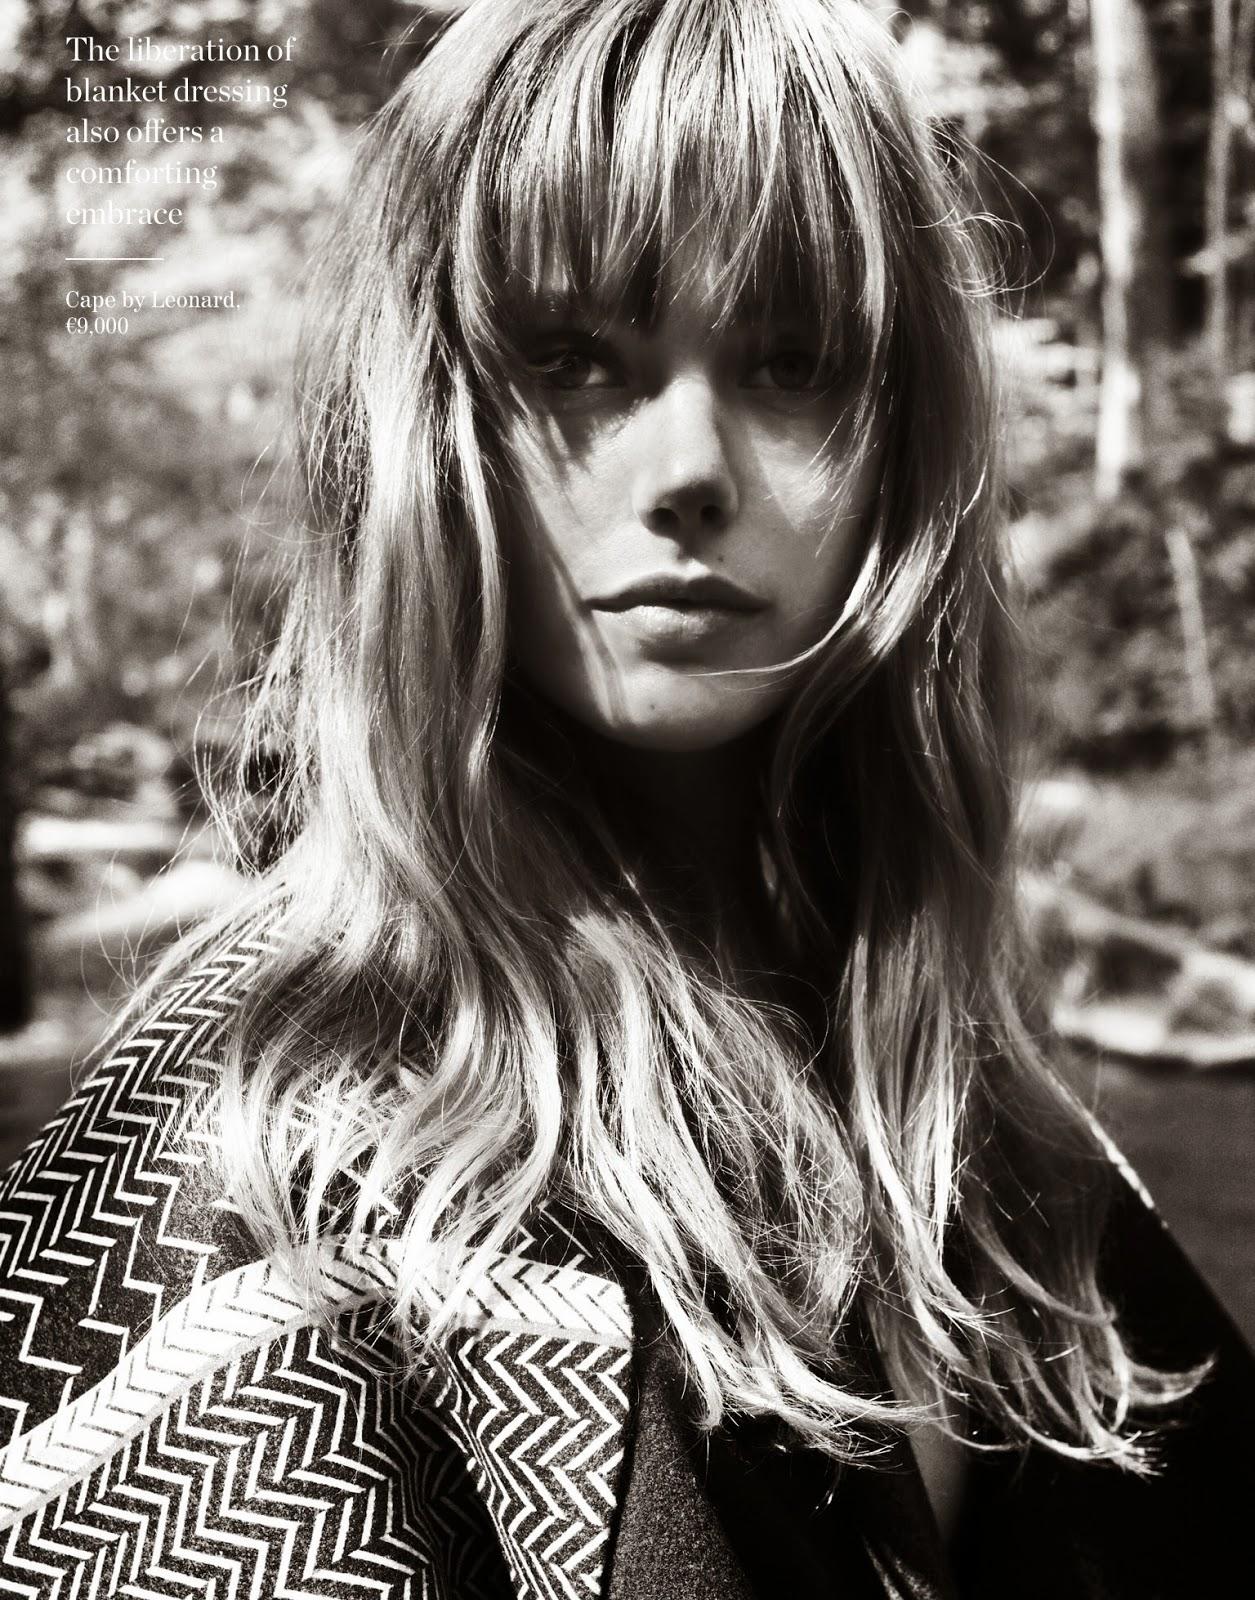 model Frida Gustavsson with make-up from Sam Addington